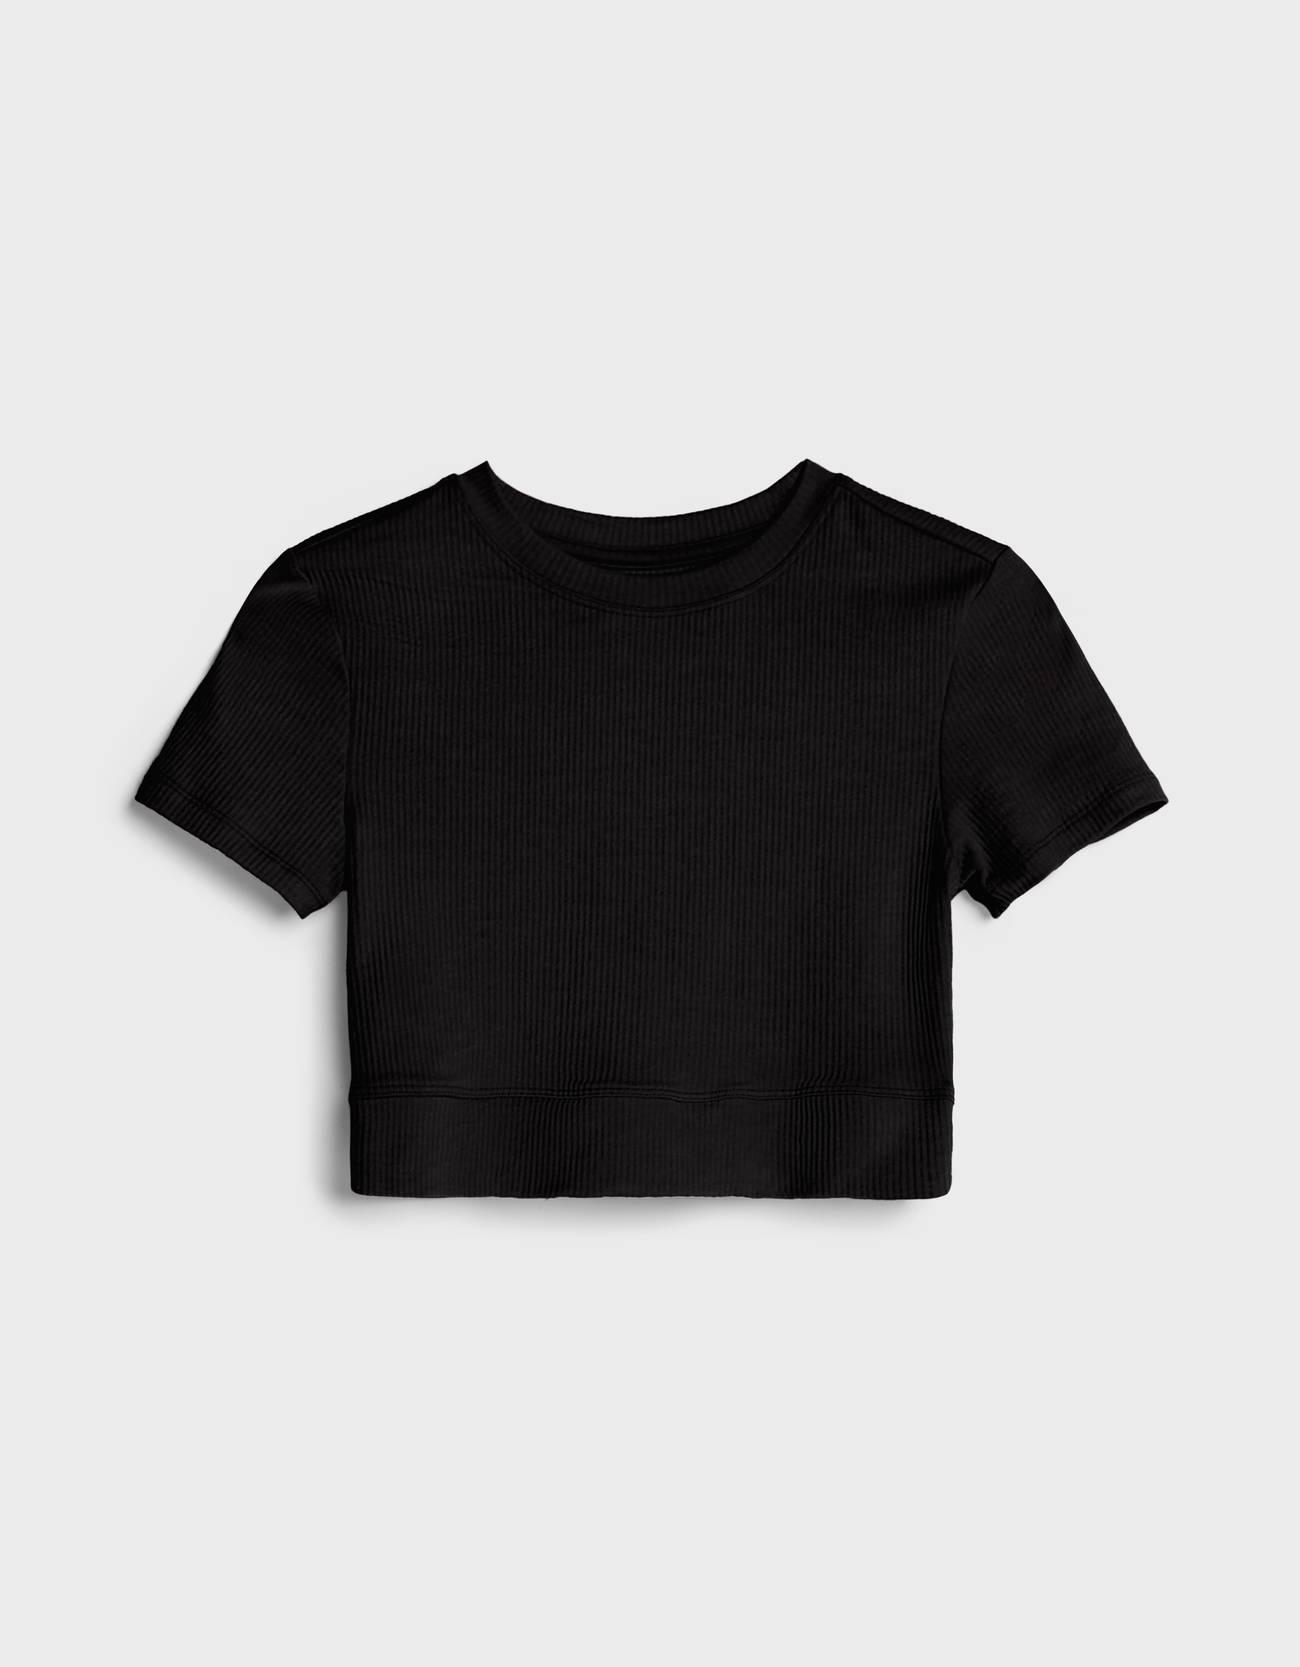 Camiseta técnica.